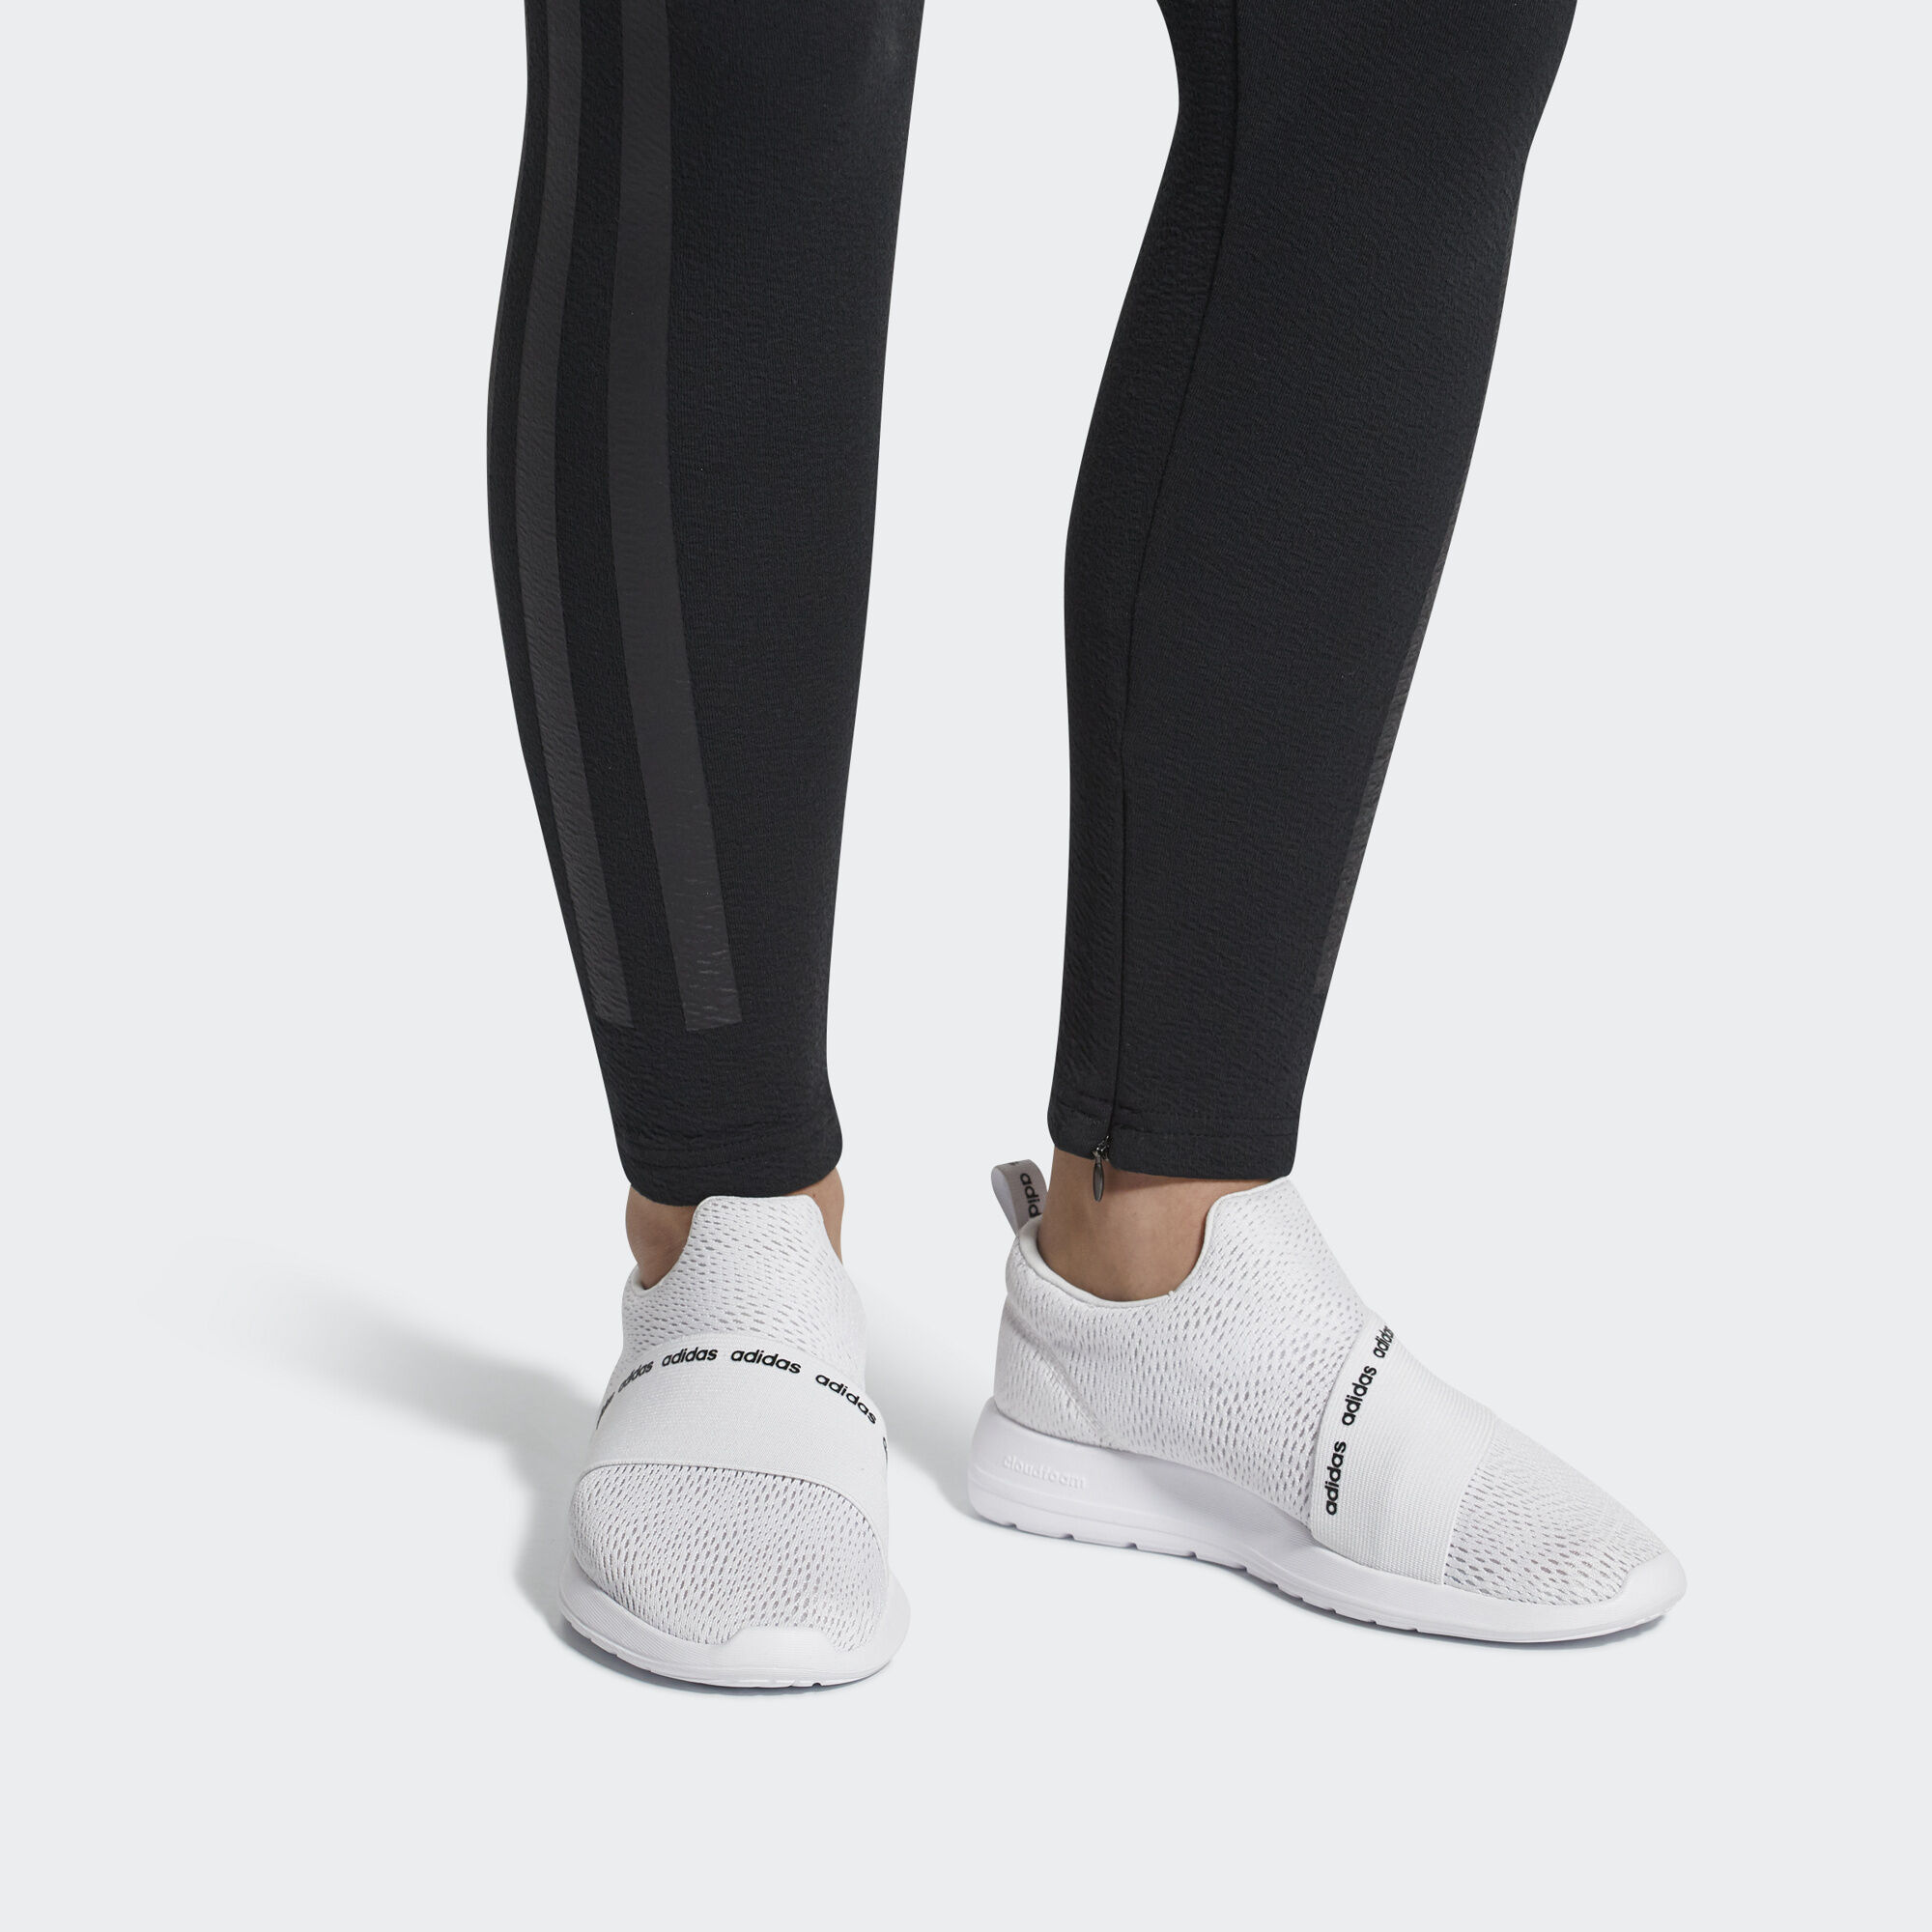 info for 1a423 5031b adidas Cloudfoam Refine Adapt Shoes - Black  adidas UK